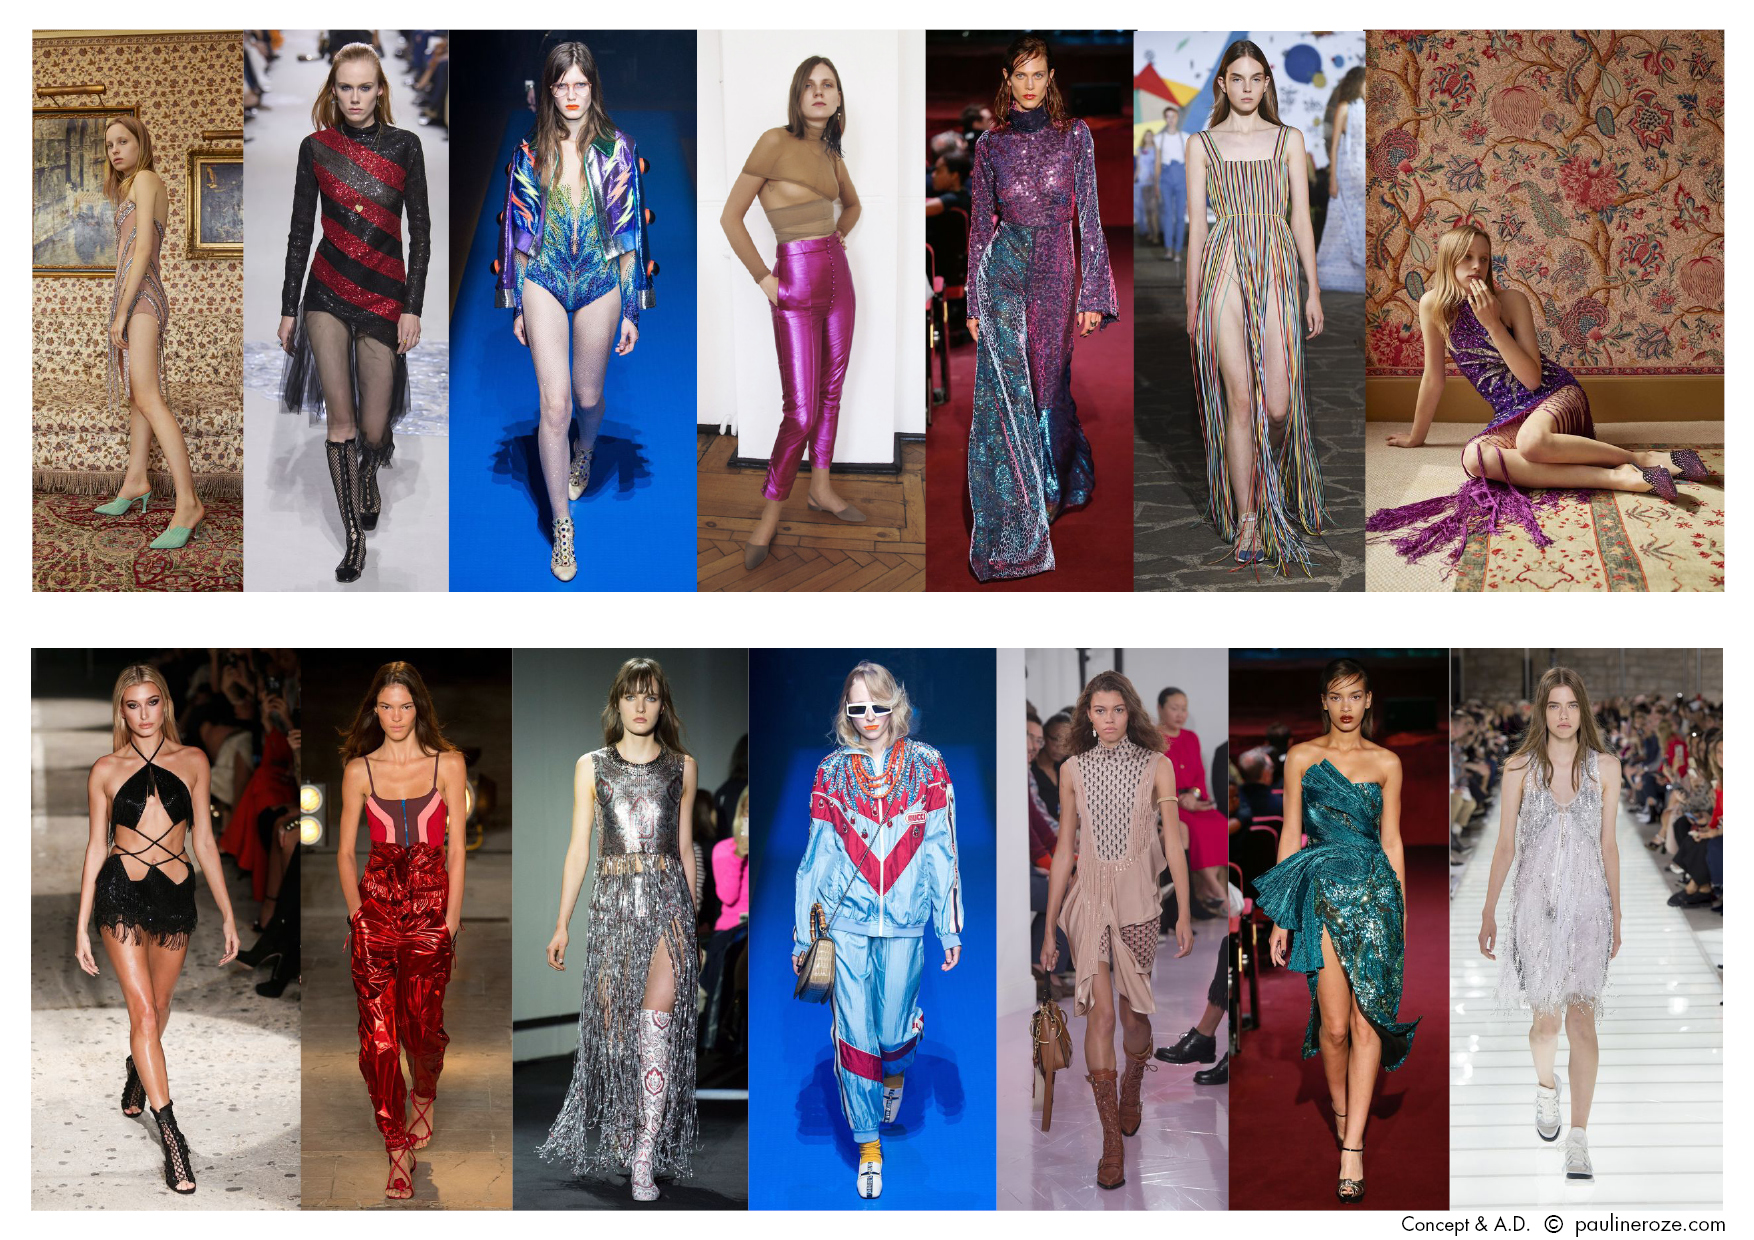 From left to right:  Attico, Dior, Gucci, Hillier Bartley, Halpern, Vionnet, Attico, Julian MacDonald, Isabel Marant, Paco Rabanne, Gucci, Chloé, Halpern, Louis Vuitton